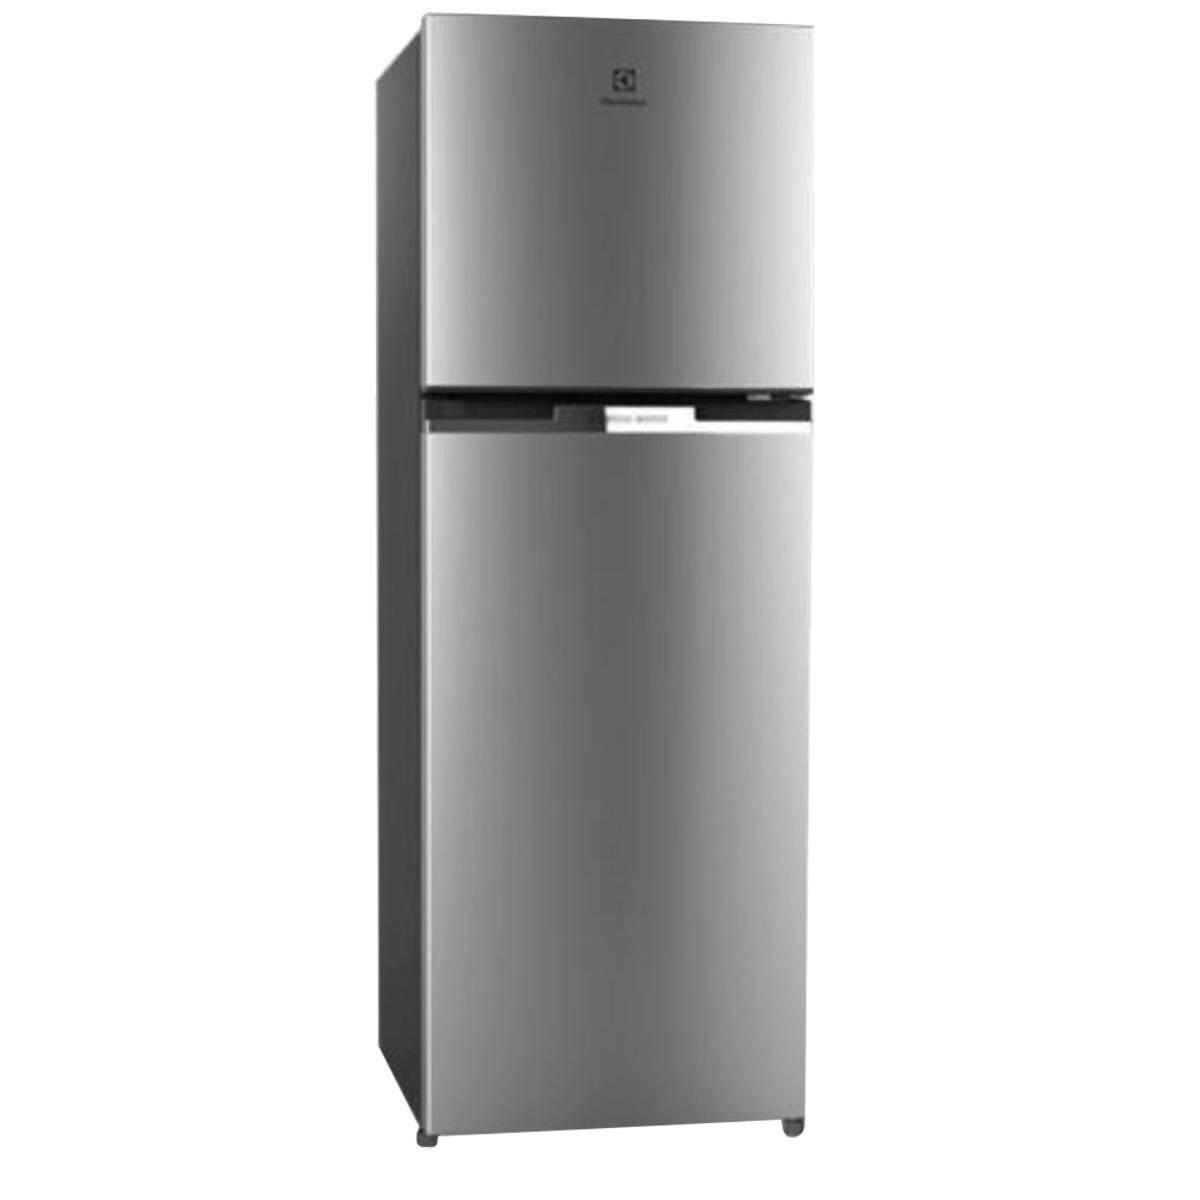 ELECTROLUX ตู้เย็น 2 ประตู 11.3 คิว รุ่น ETB 3200 MG